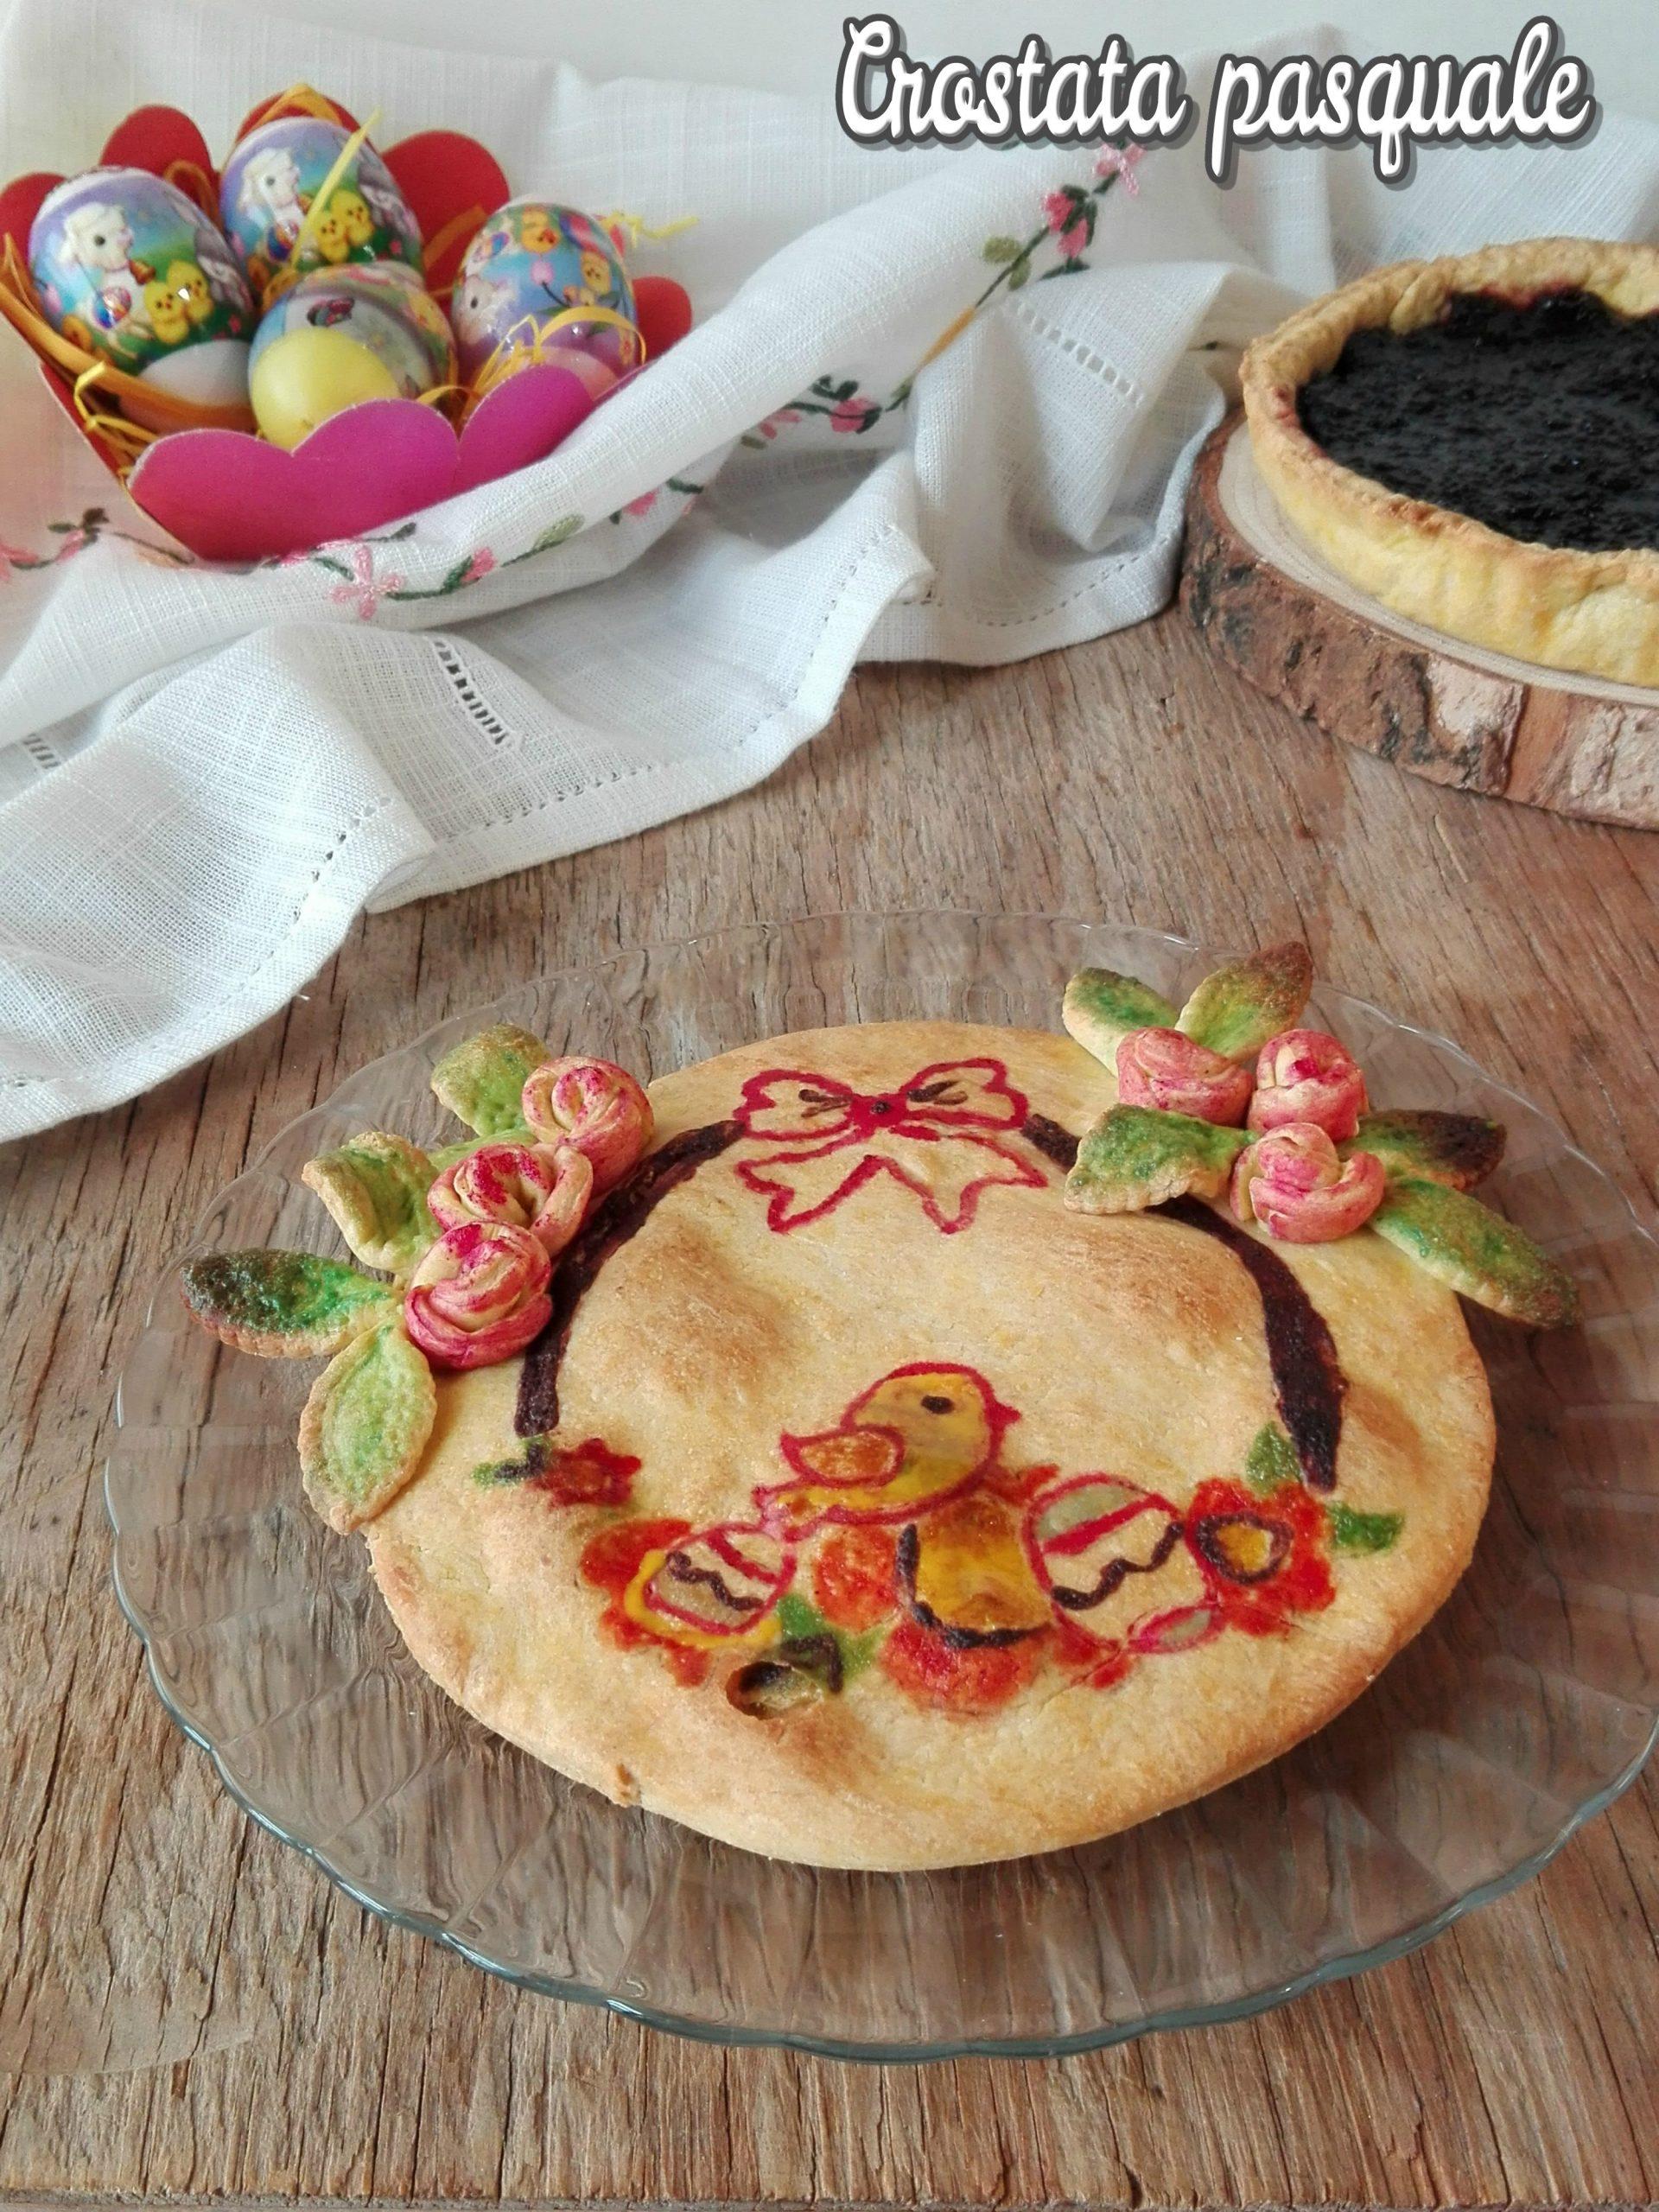 Crostata pasquale